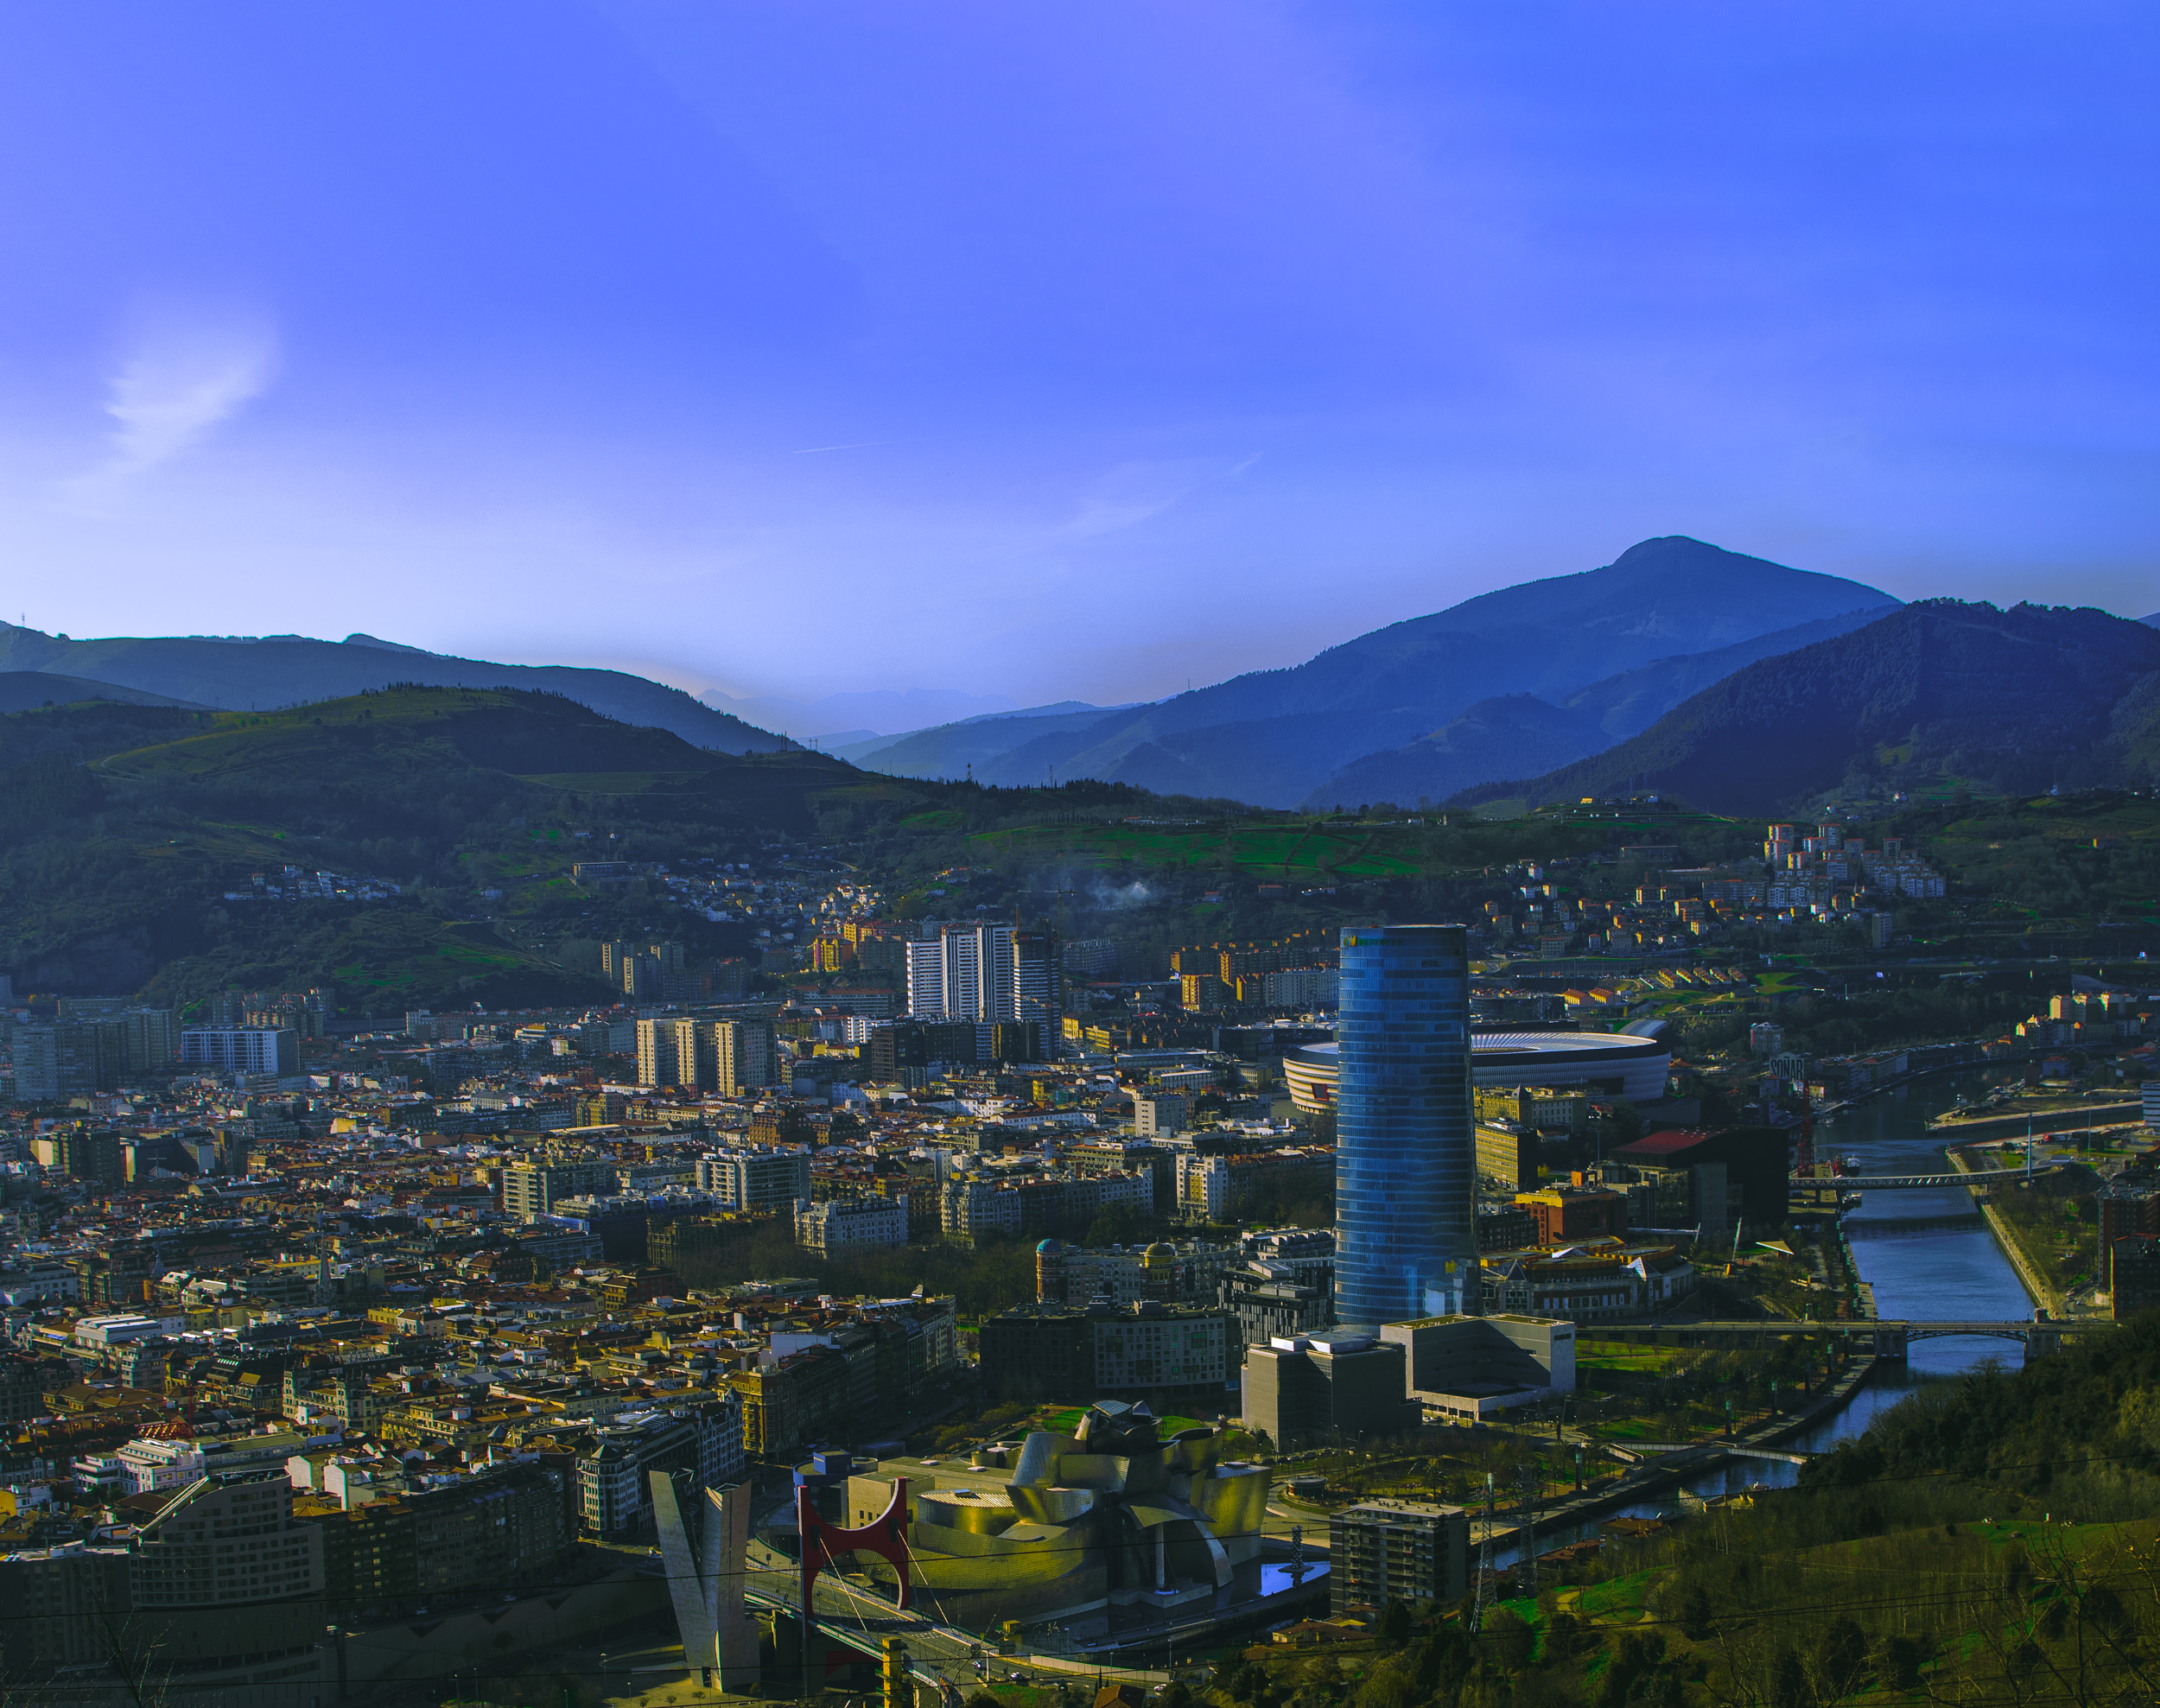 City of Bilbao